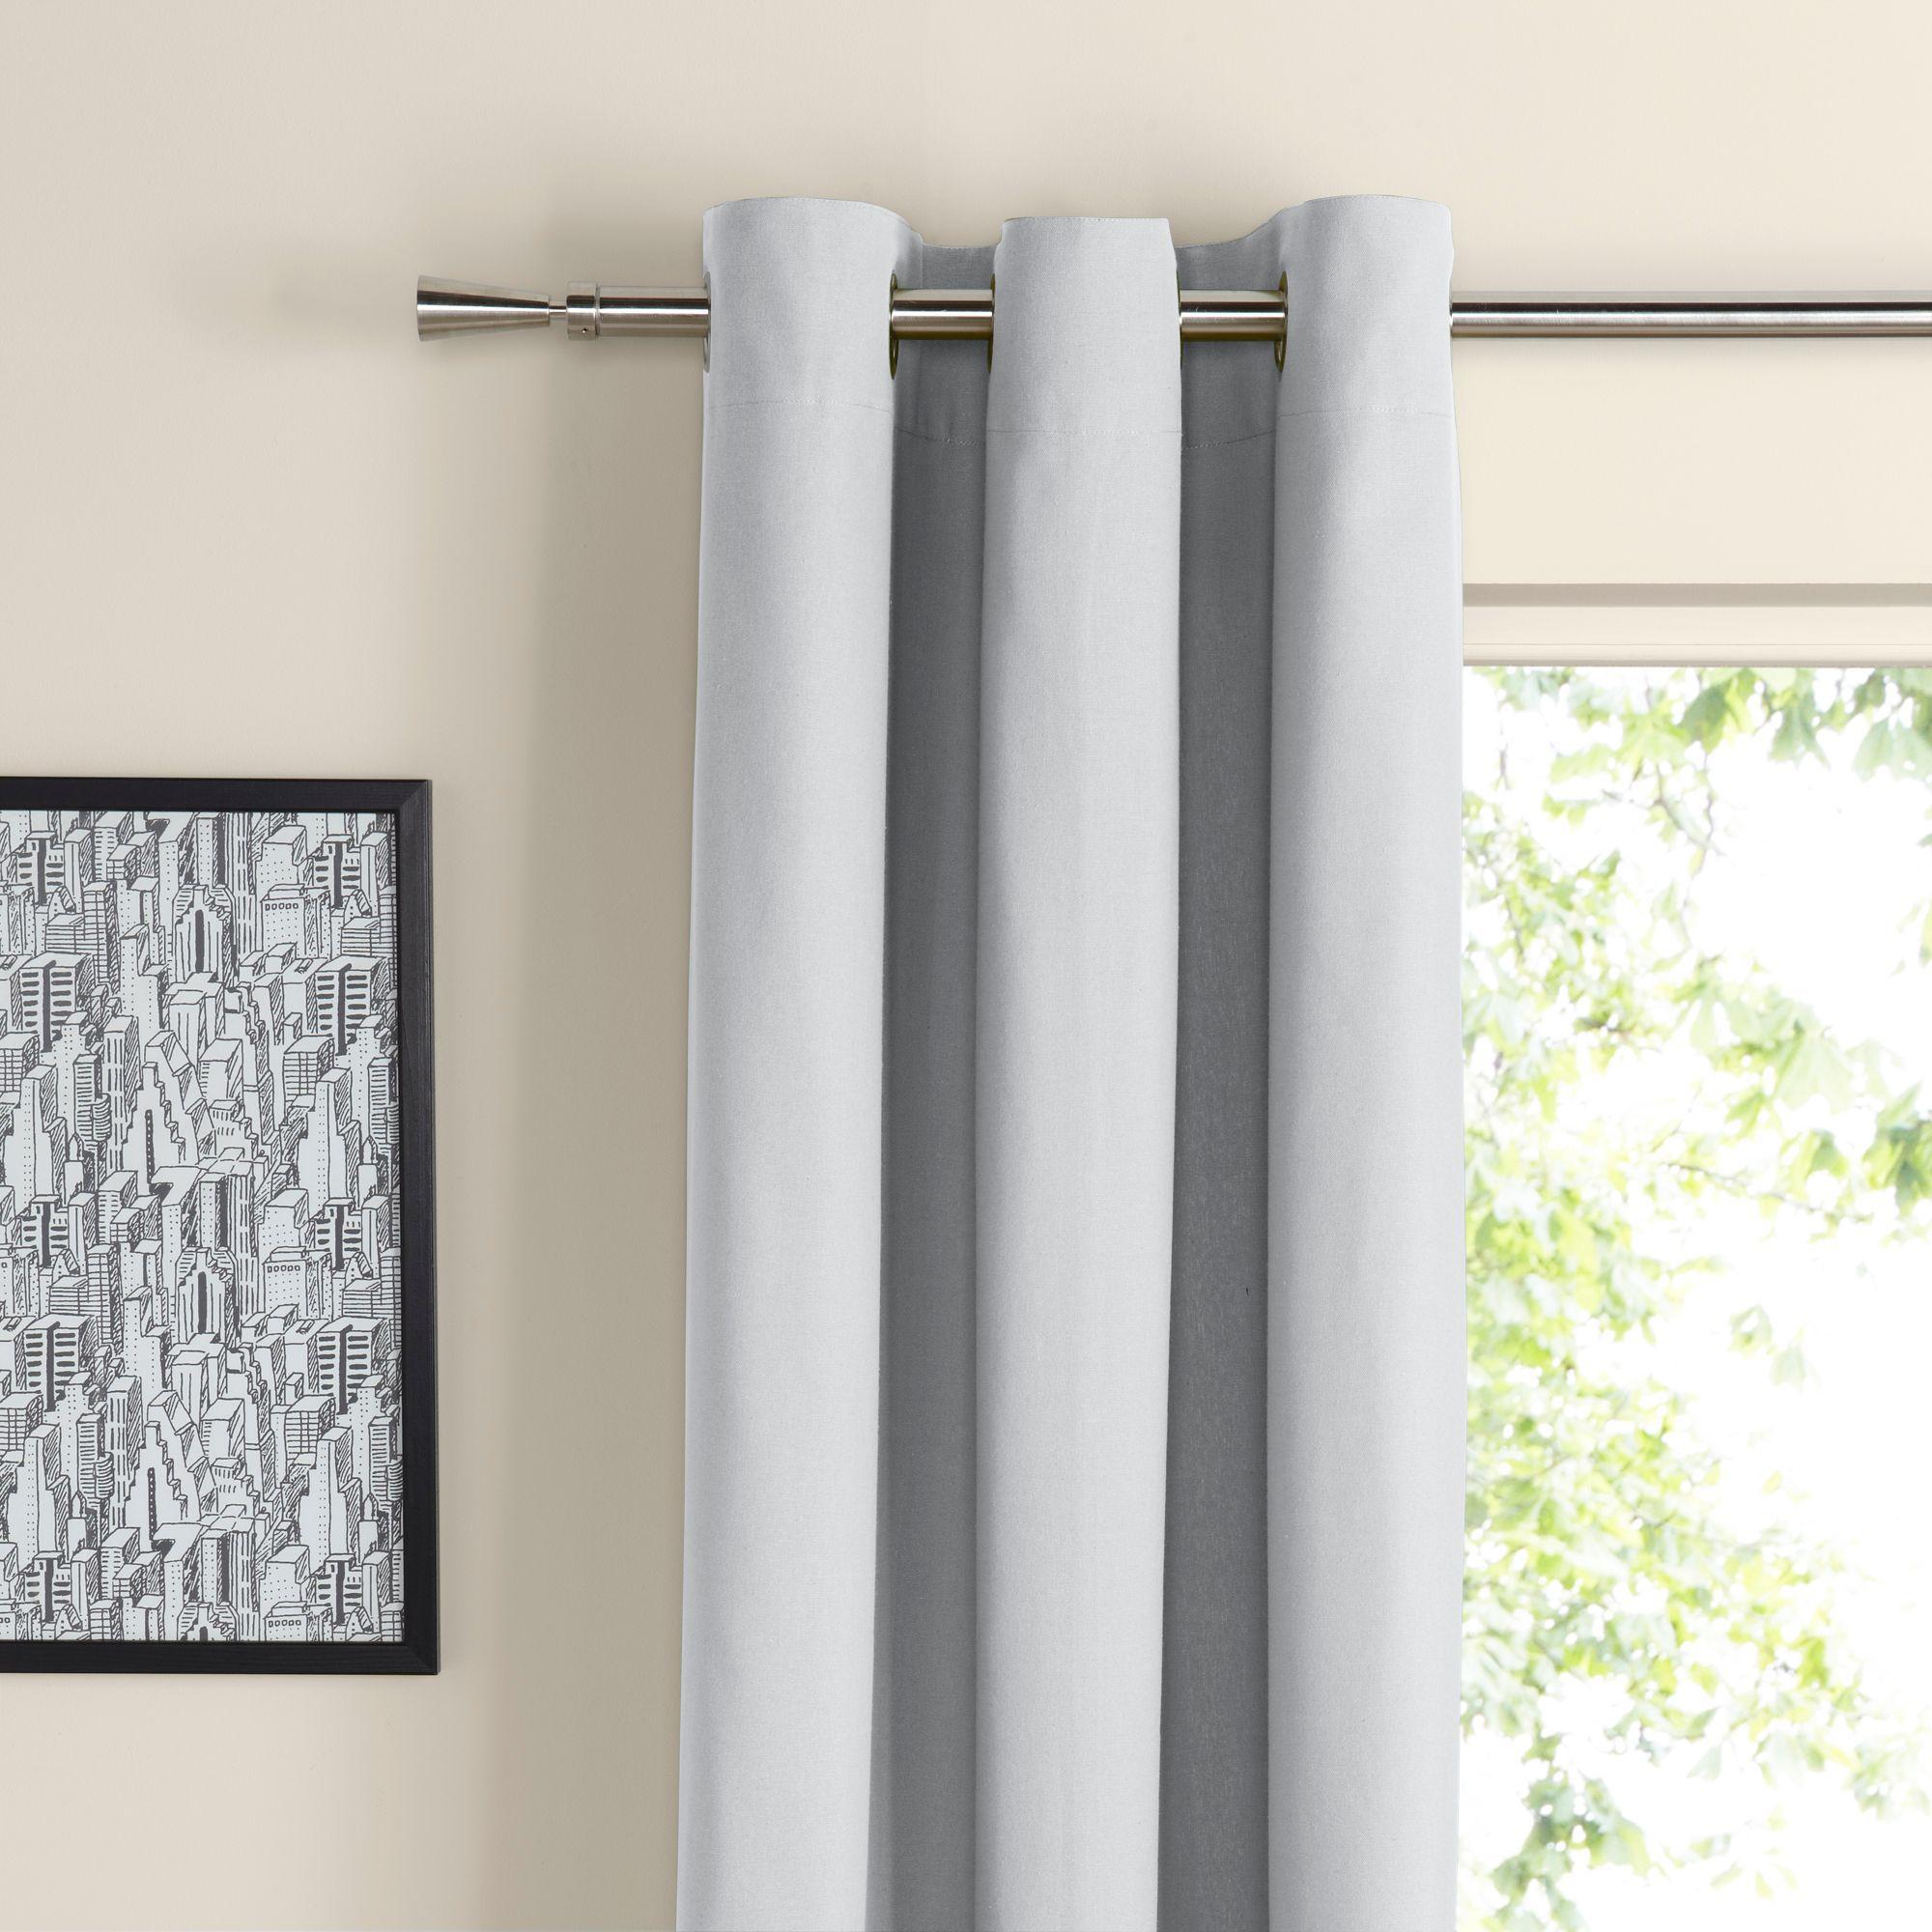 Zen Ecru Plain Eyelet Curtains (W)167 cm (L)183 cm | Departments | DIY at B&Q